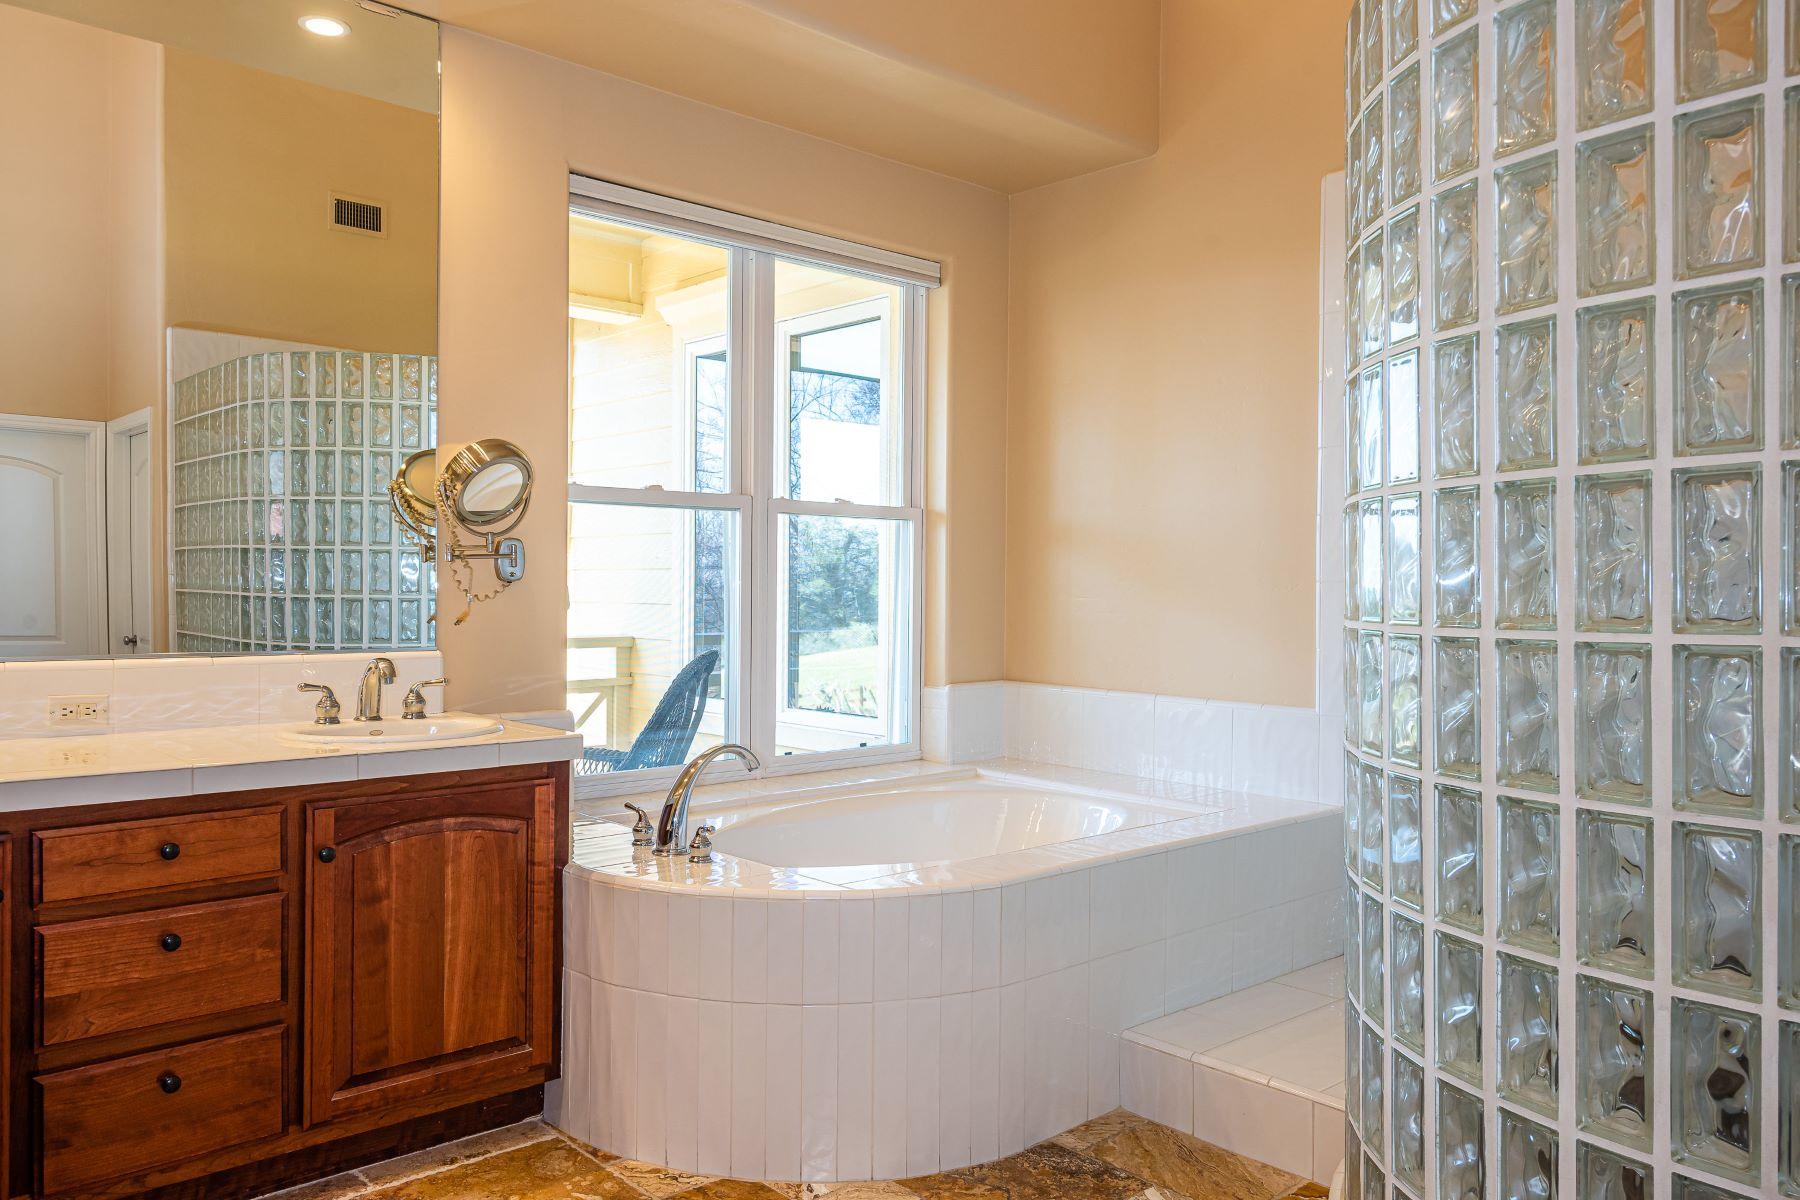 Additional photo for property listing at Vineyard Mountain Ranch 69300 Vineyard Canyon Road San Miguel, California 93451 Estados Unidos